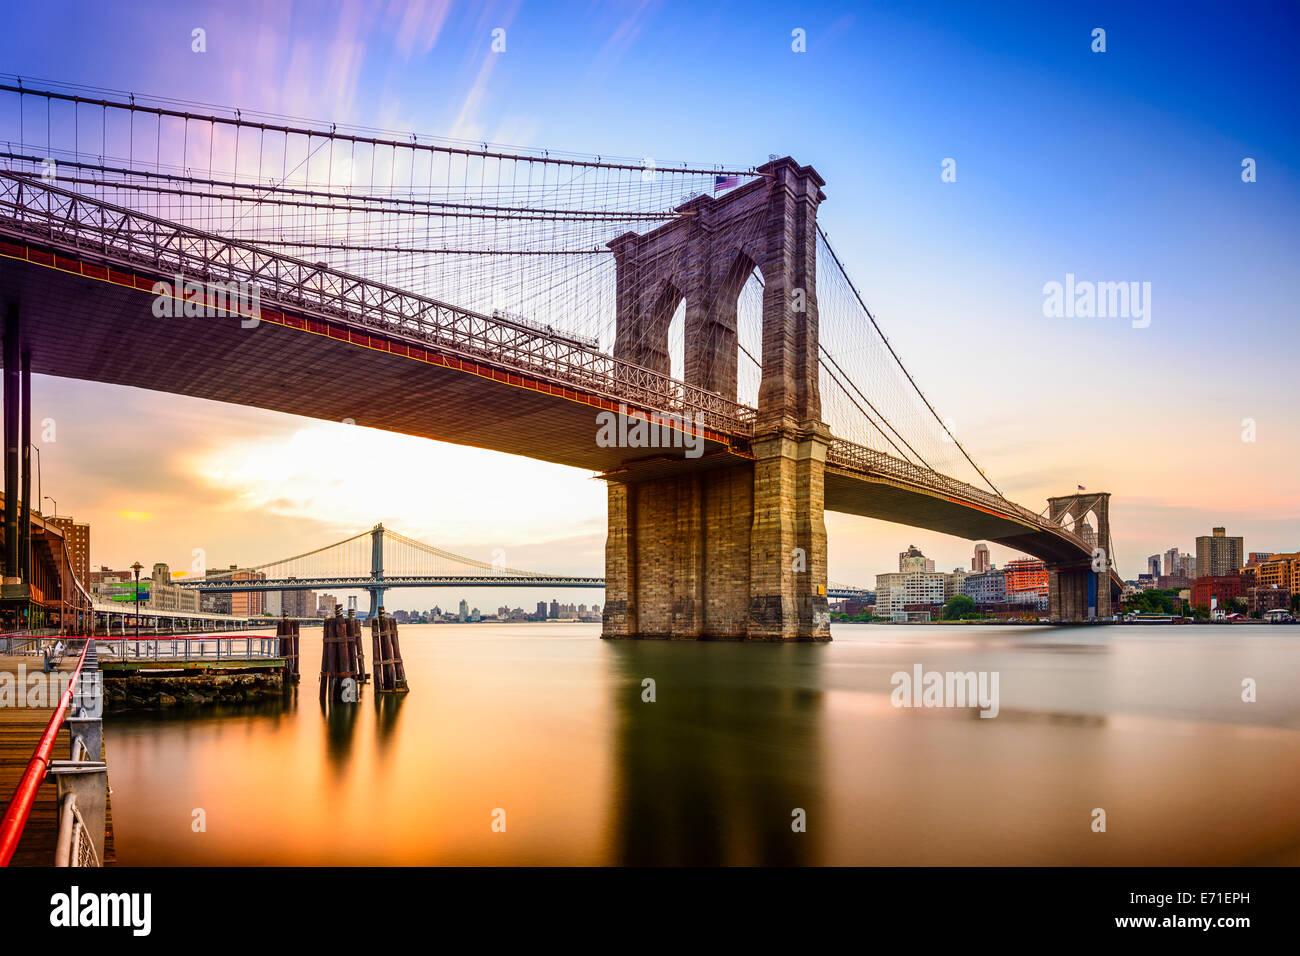 New York City, USA an der Brooklyn Bridge und East River in der Morgendämmerung. Stockbild